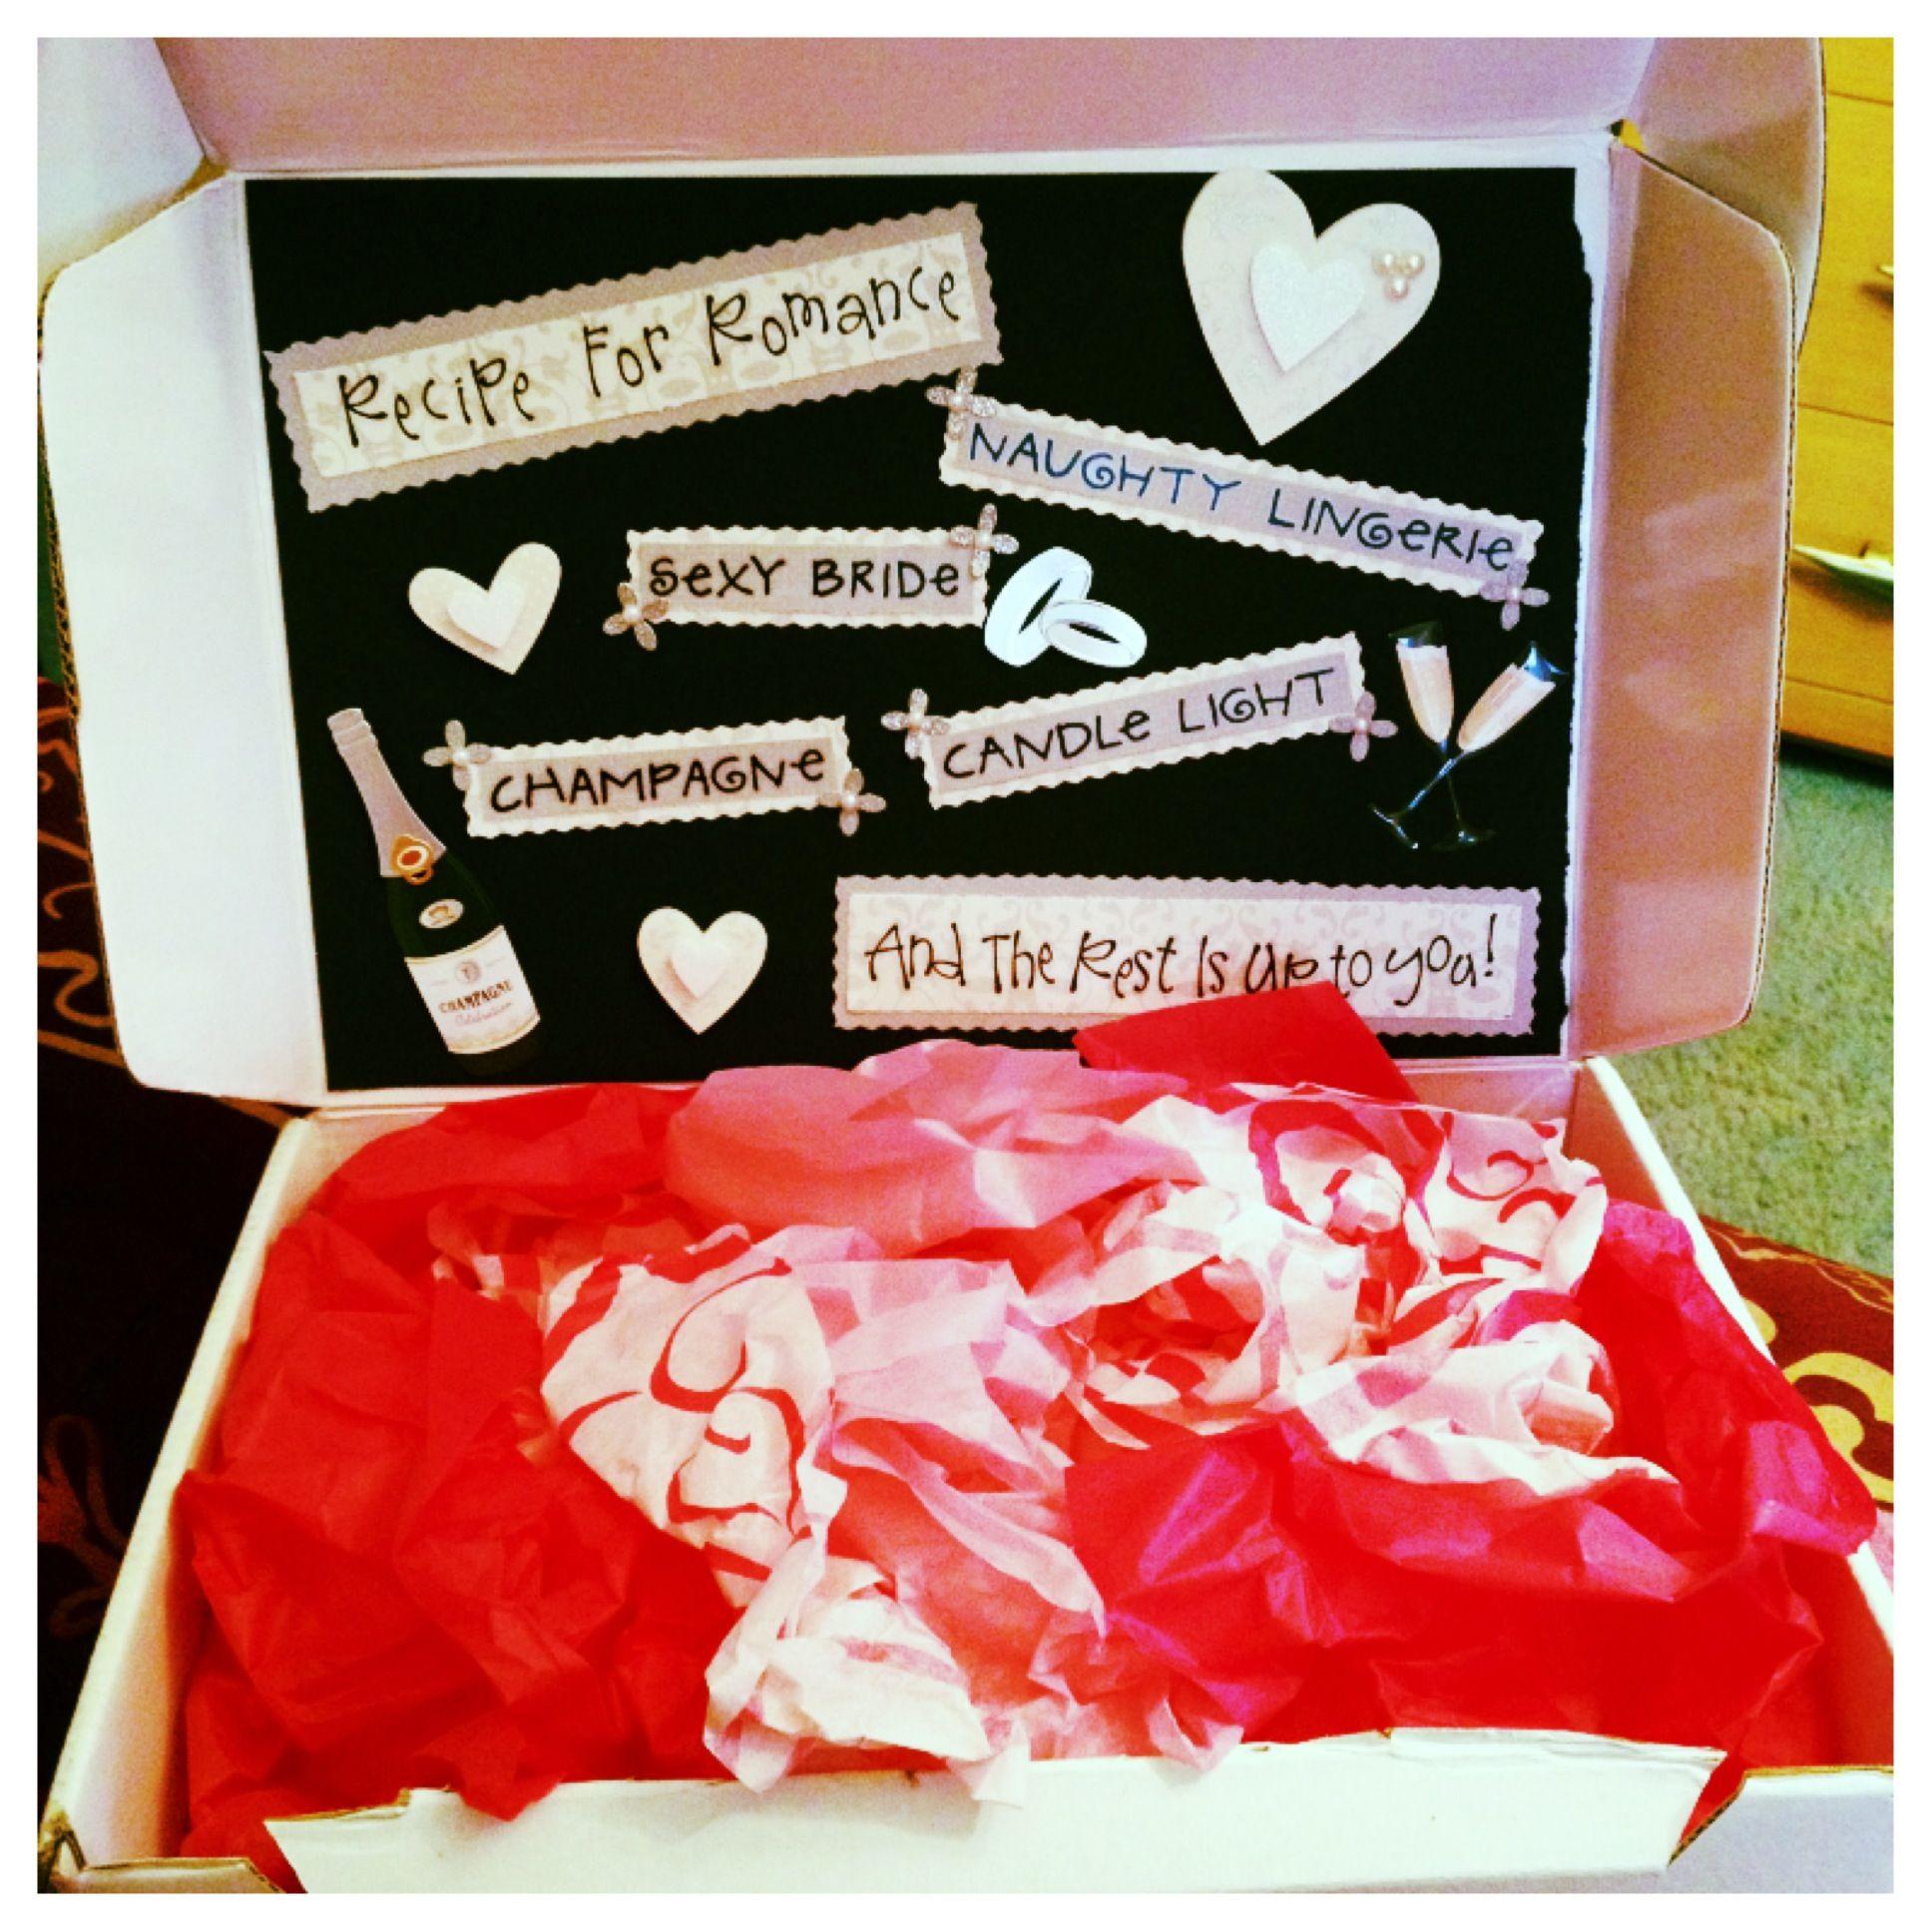 DIY Bachelorette Gift For Bride  Bachelorette Gift Idea A simple t I made for a friend s